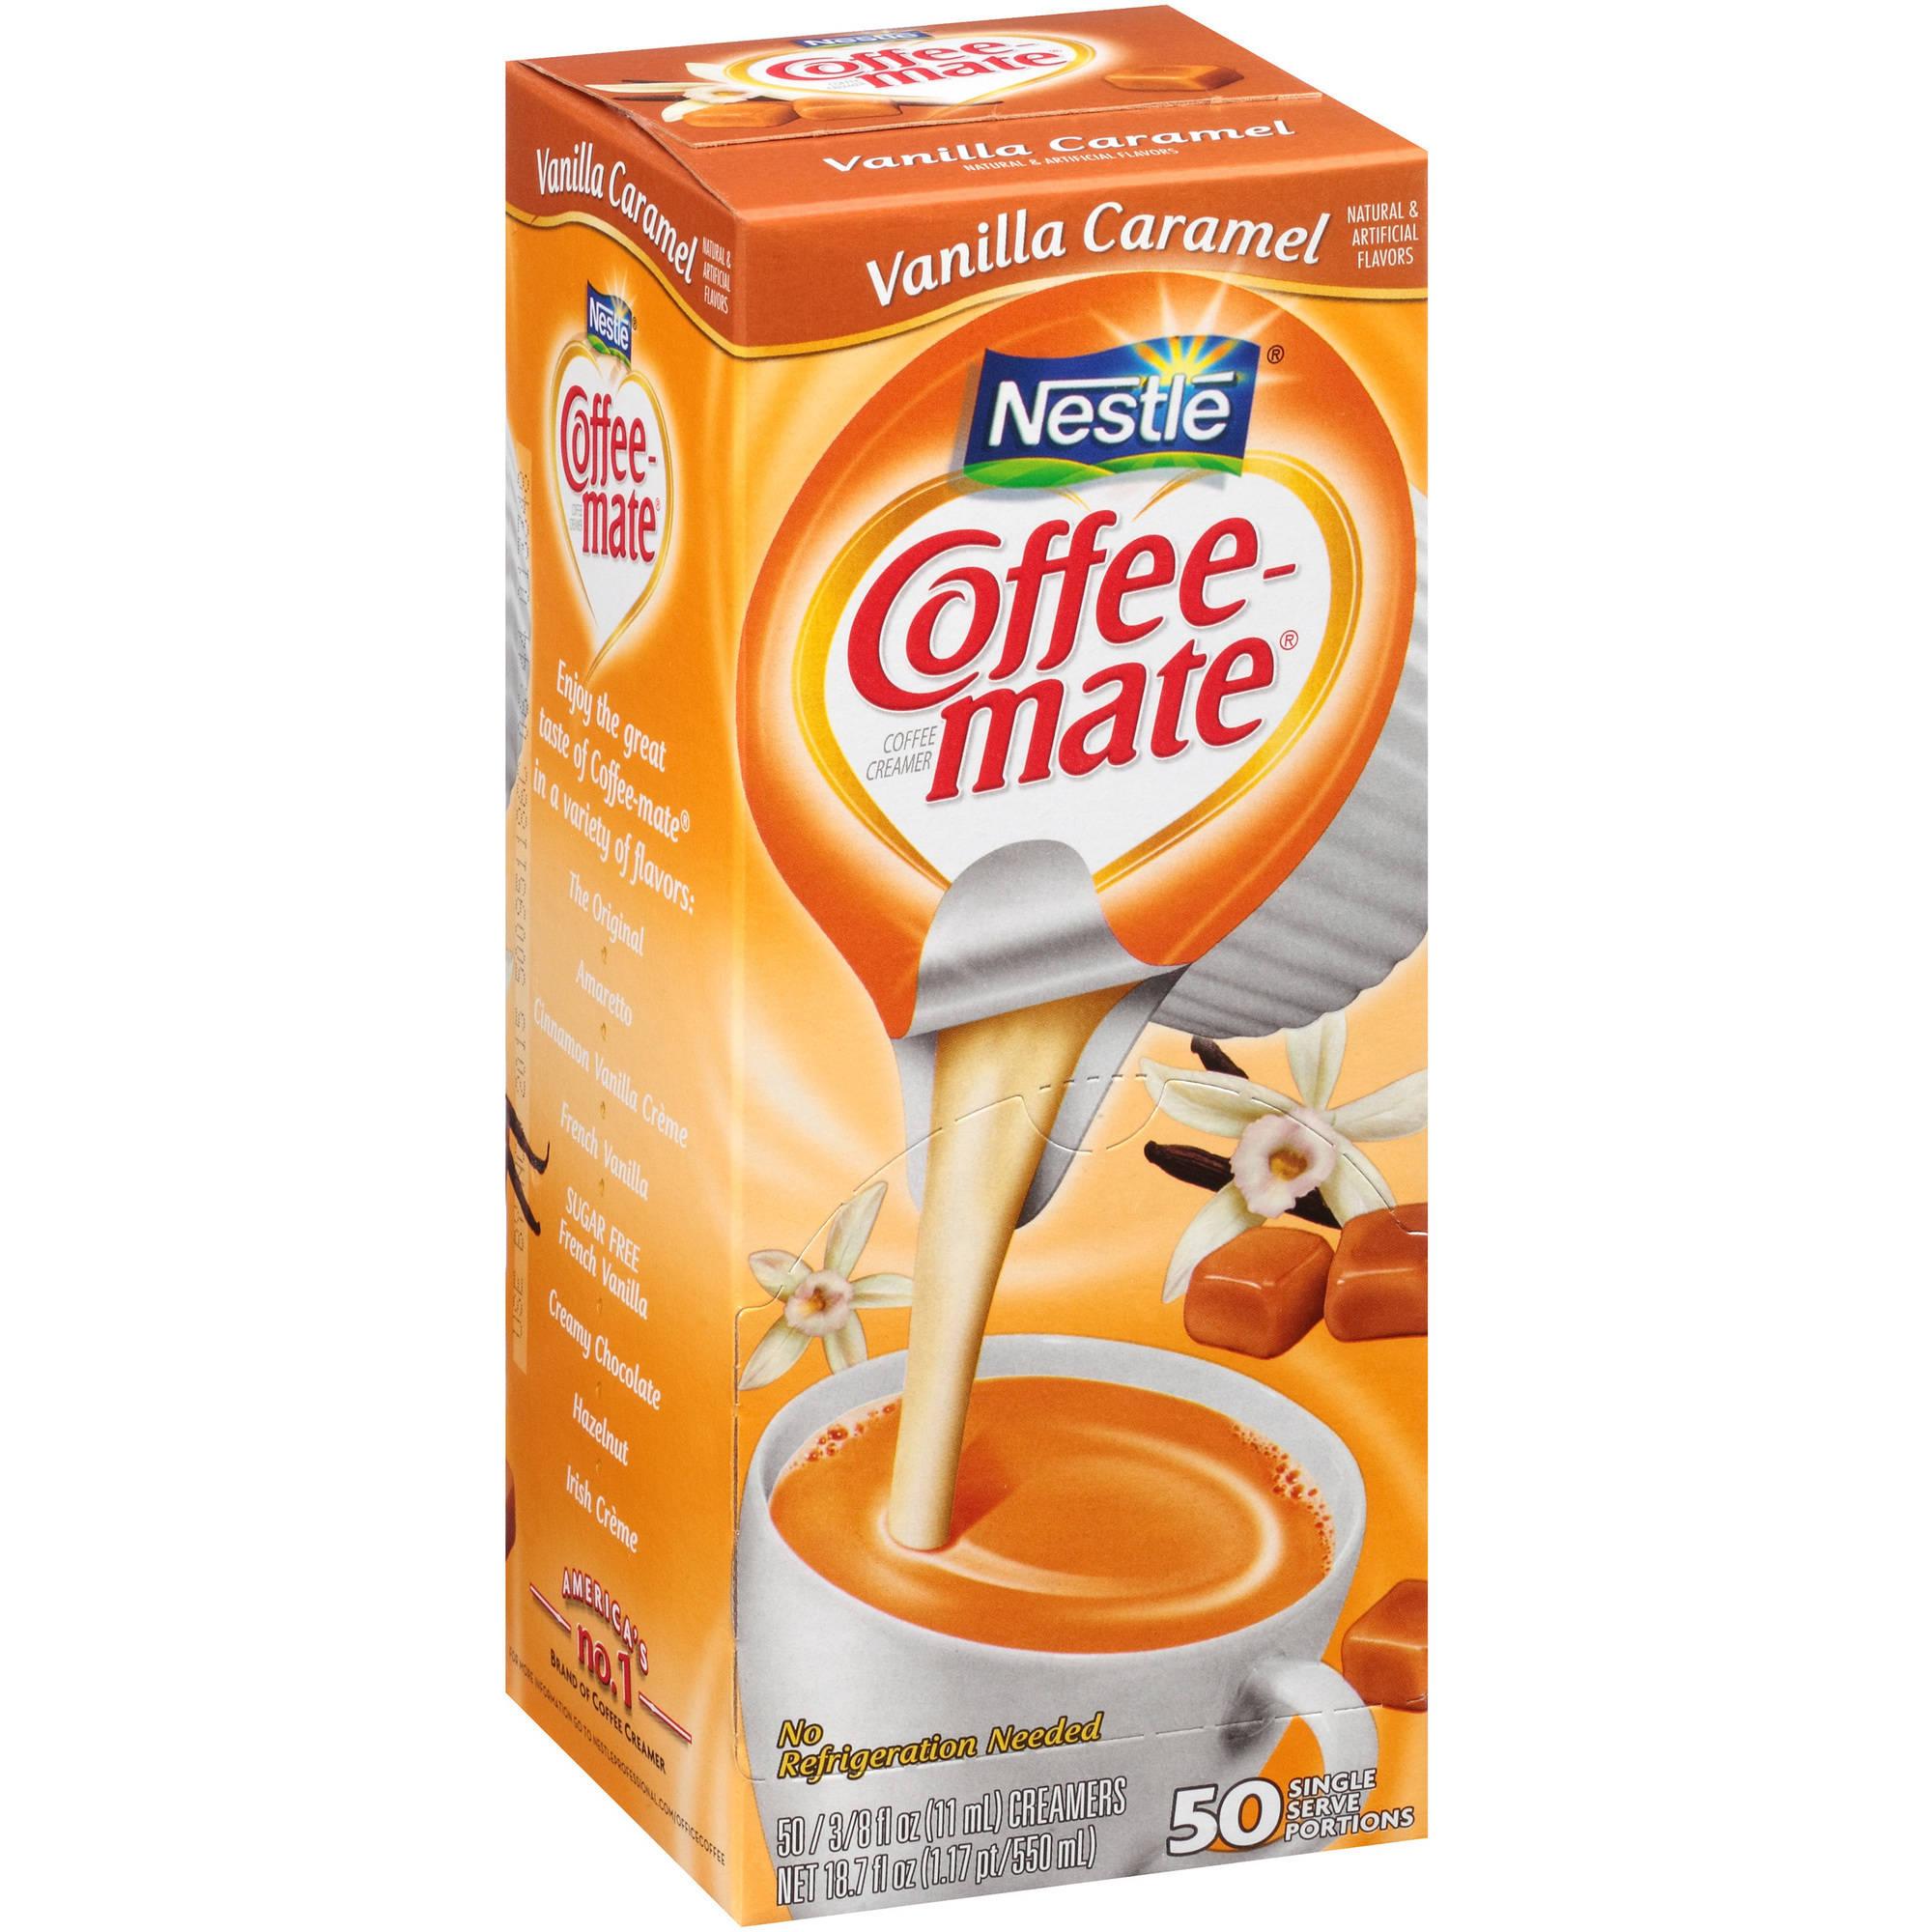 Nestlé Coffee-mate Vanilla Caramel Coffee Creamer 50-0.375 fl. oz. Tubs